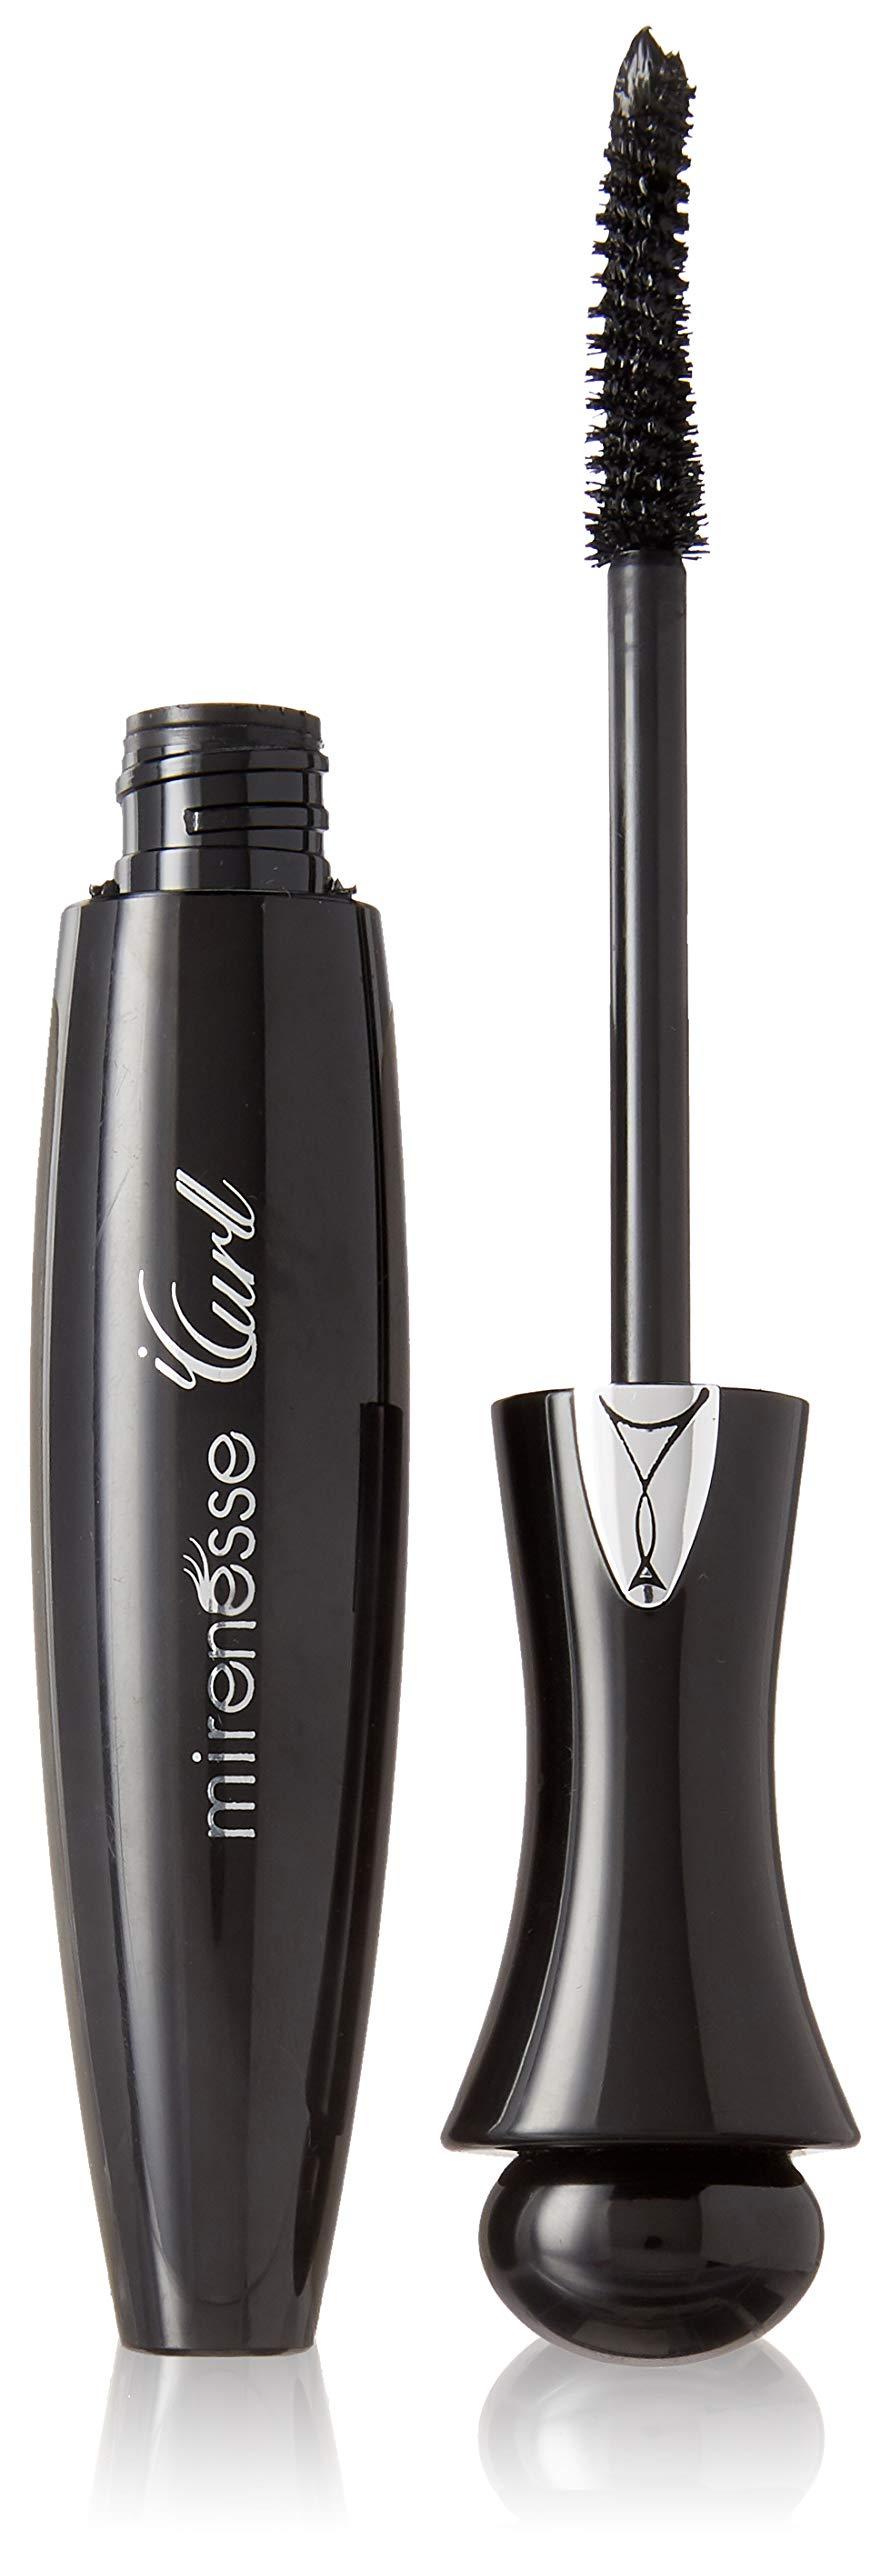 """Mirenesse Cosmetics"" iCurl 24 Hr Secret Weapon Mascara 10g / 0.35oz - AUTHENTIC"